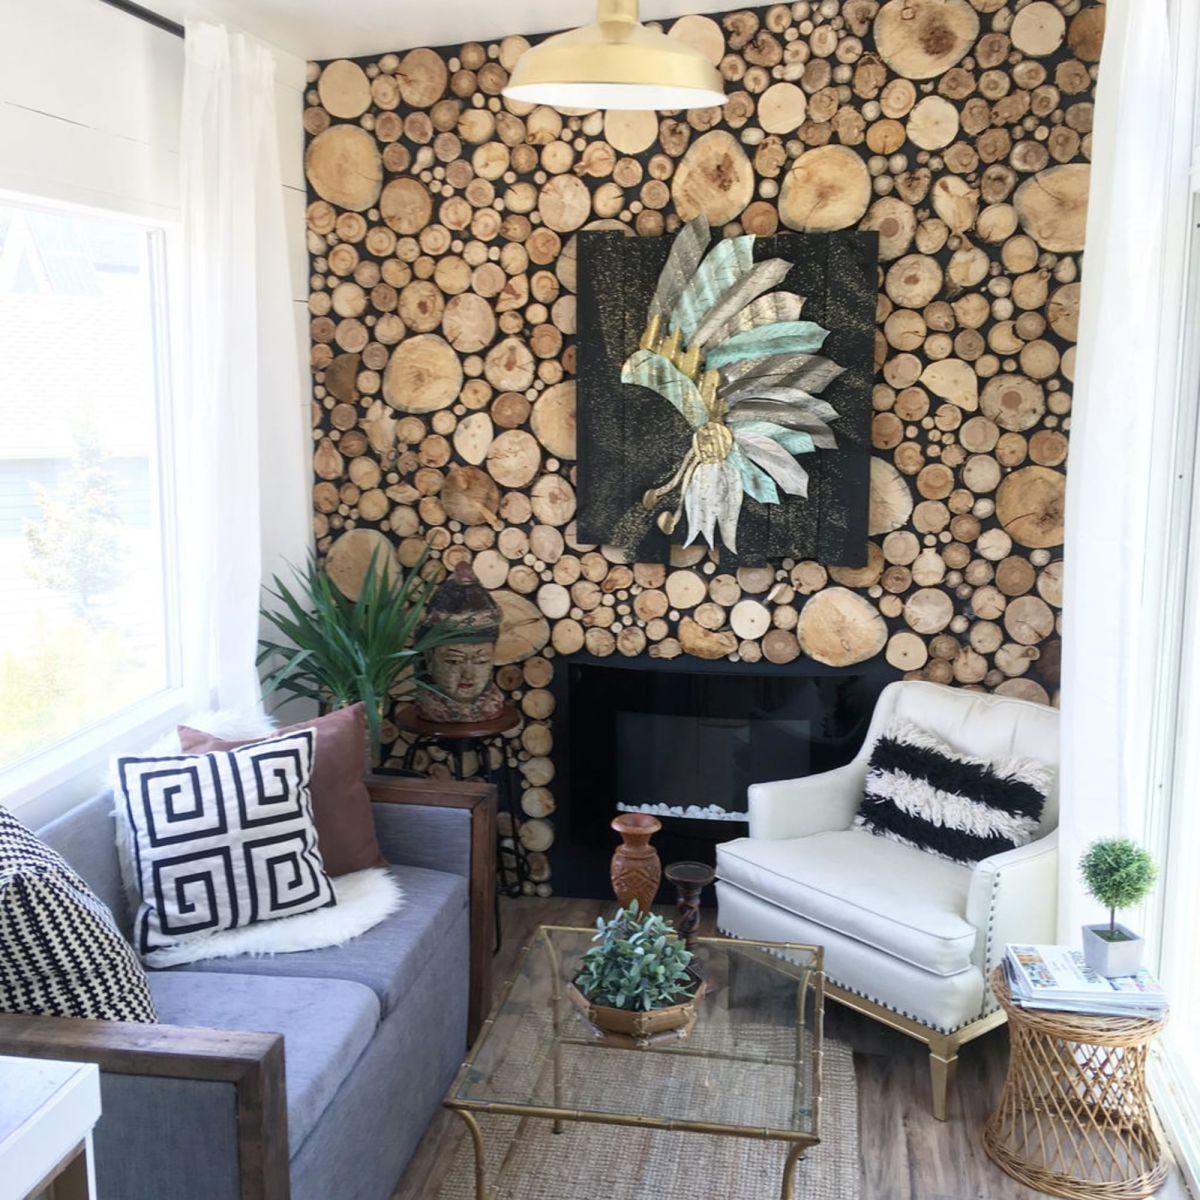 Apartments For Rent East Denver: Tiny House For Rent In Denver